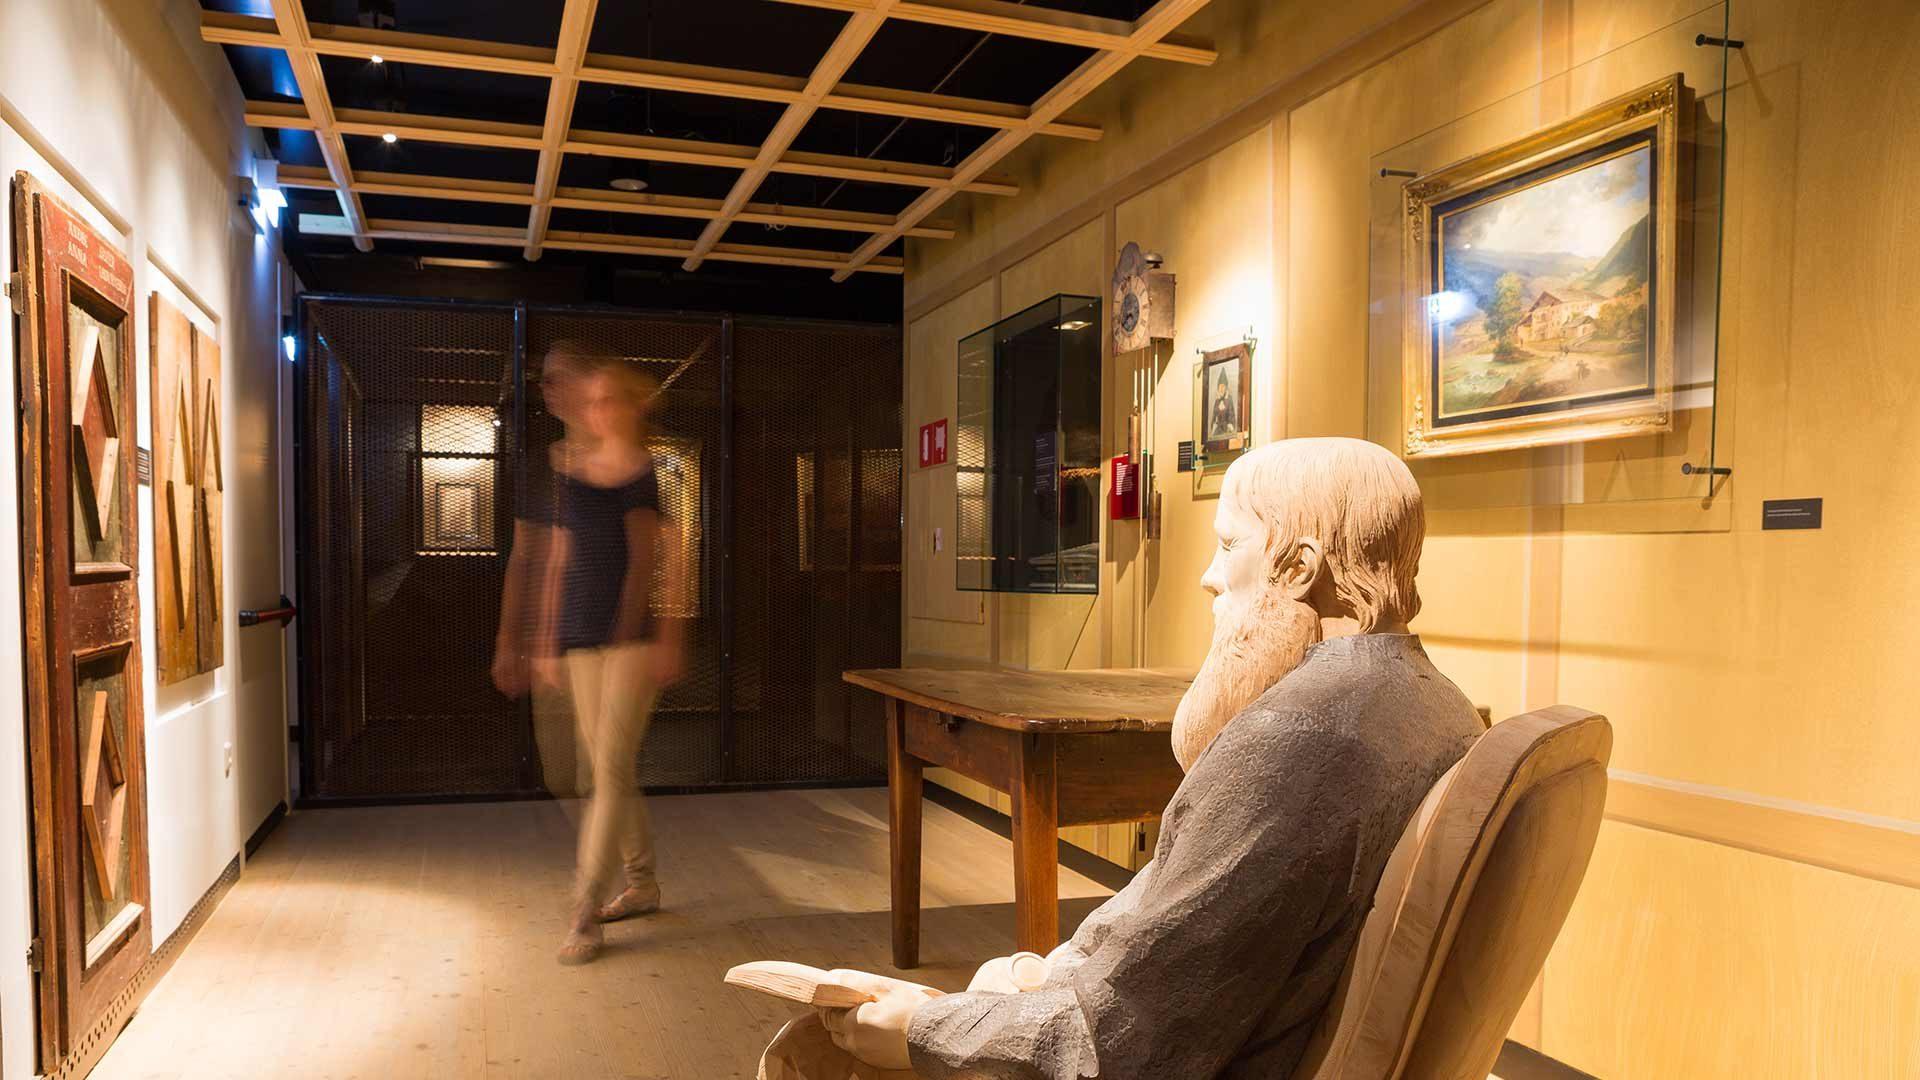 MuseumPasseier